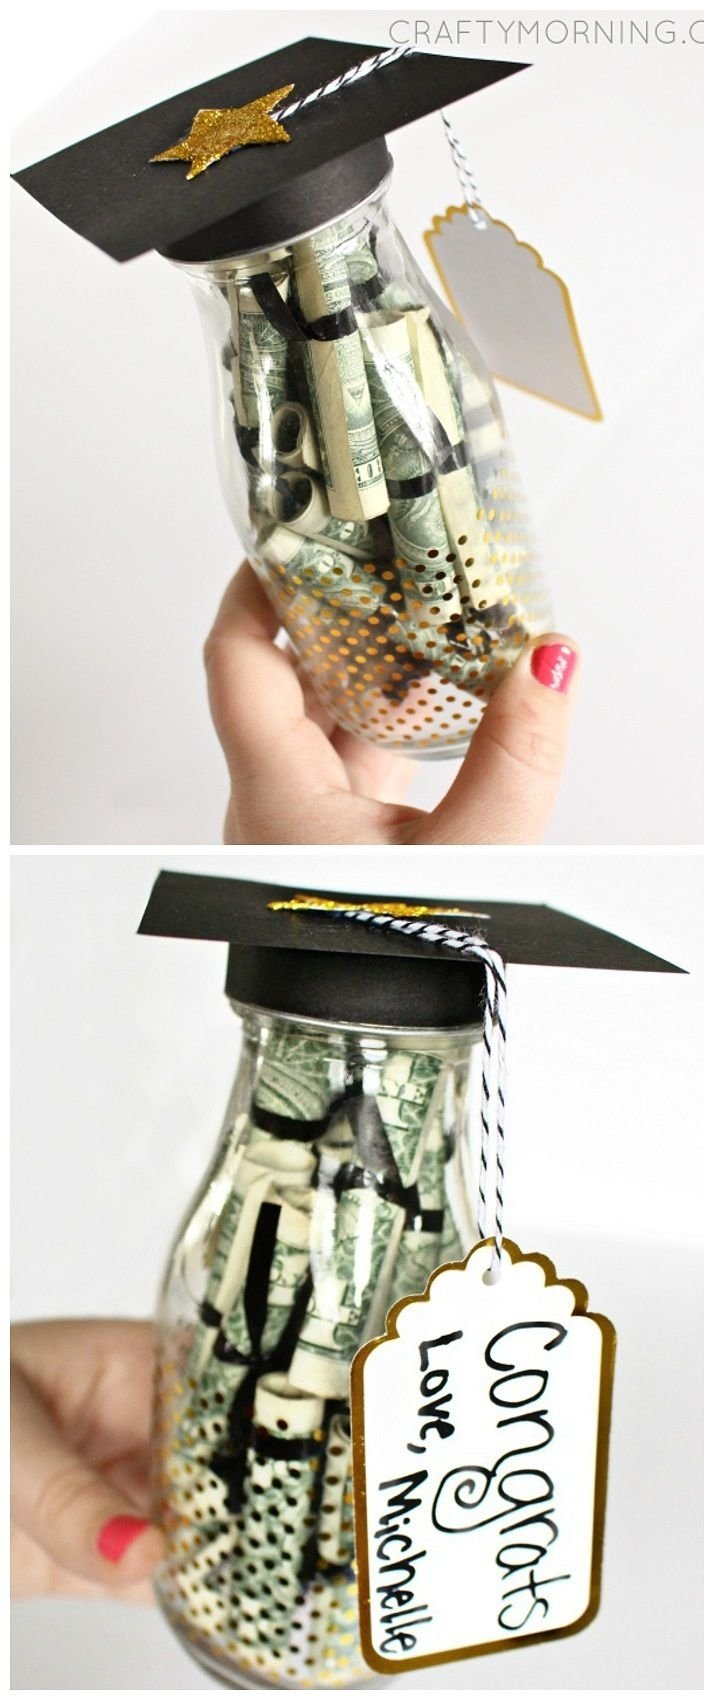 10 Best High School Graduation Gift Ideas For Her graduation glass bottle gift dollar bill diplomas perfect for 9 2021